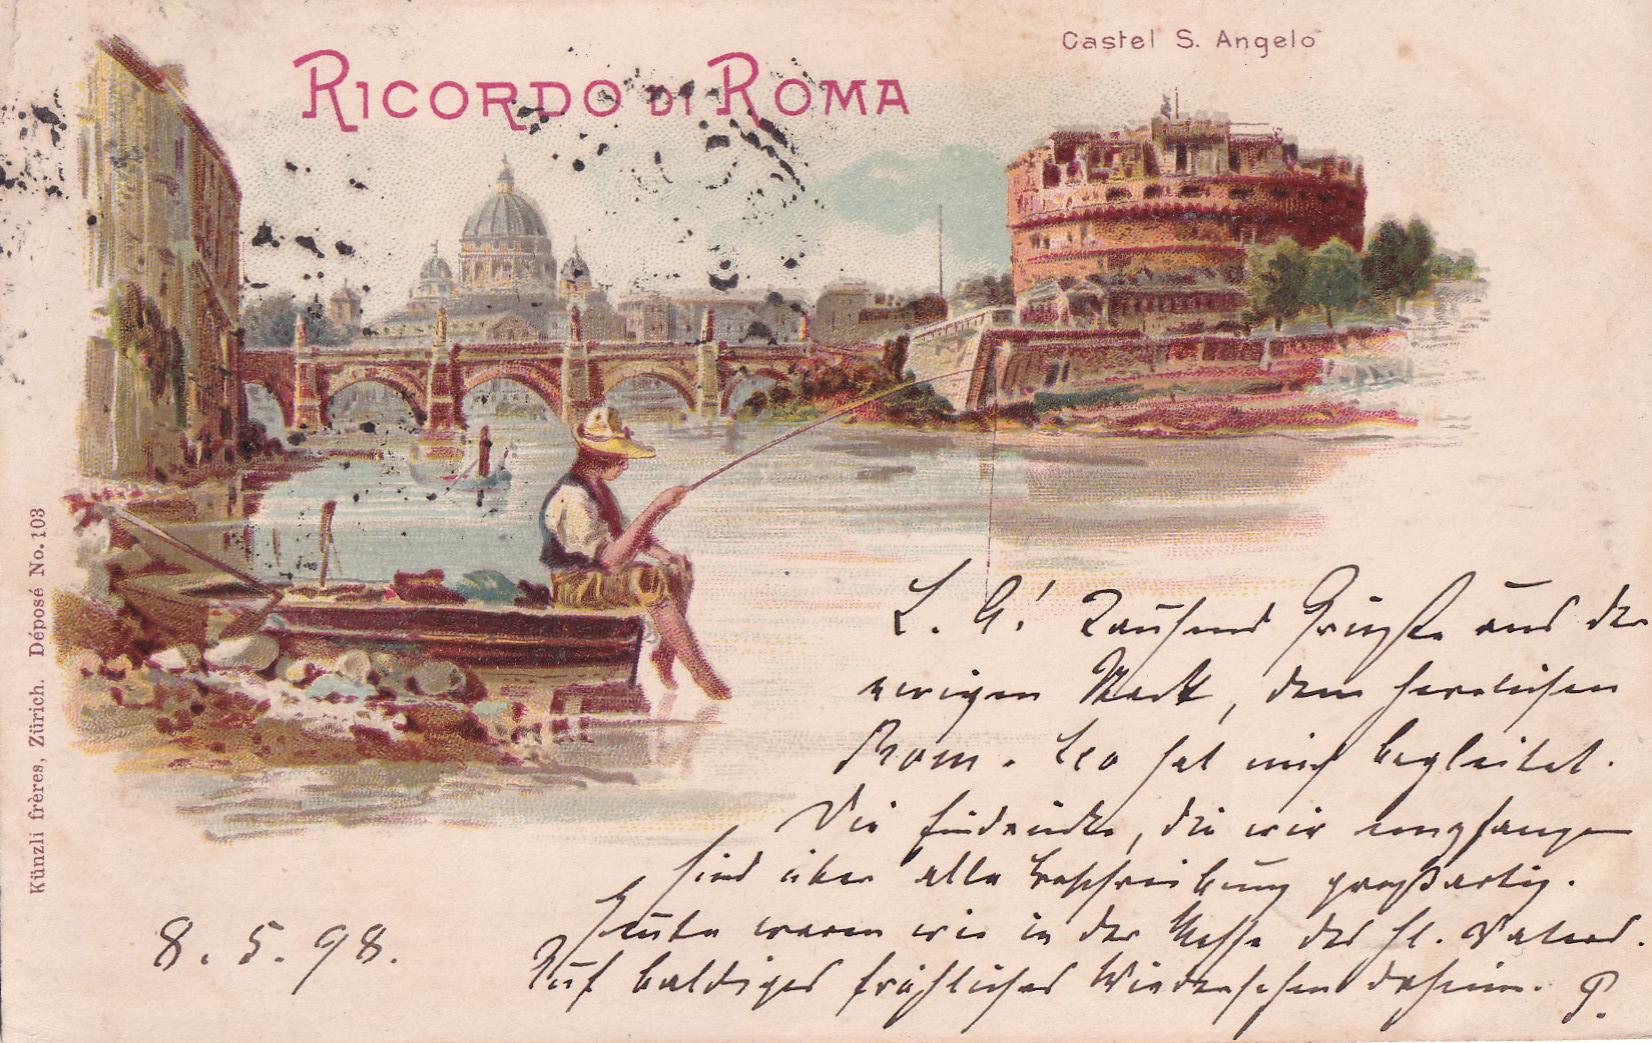 ROMA - 08.05.1898 - Erinnerung an Rom - Souvenir de Rome - Memory of Rome